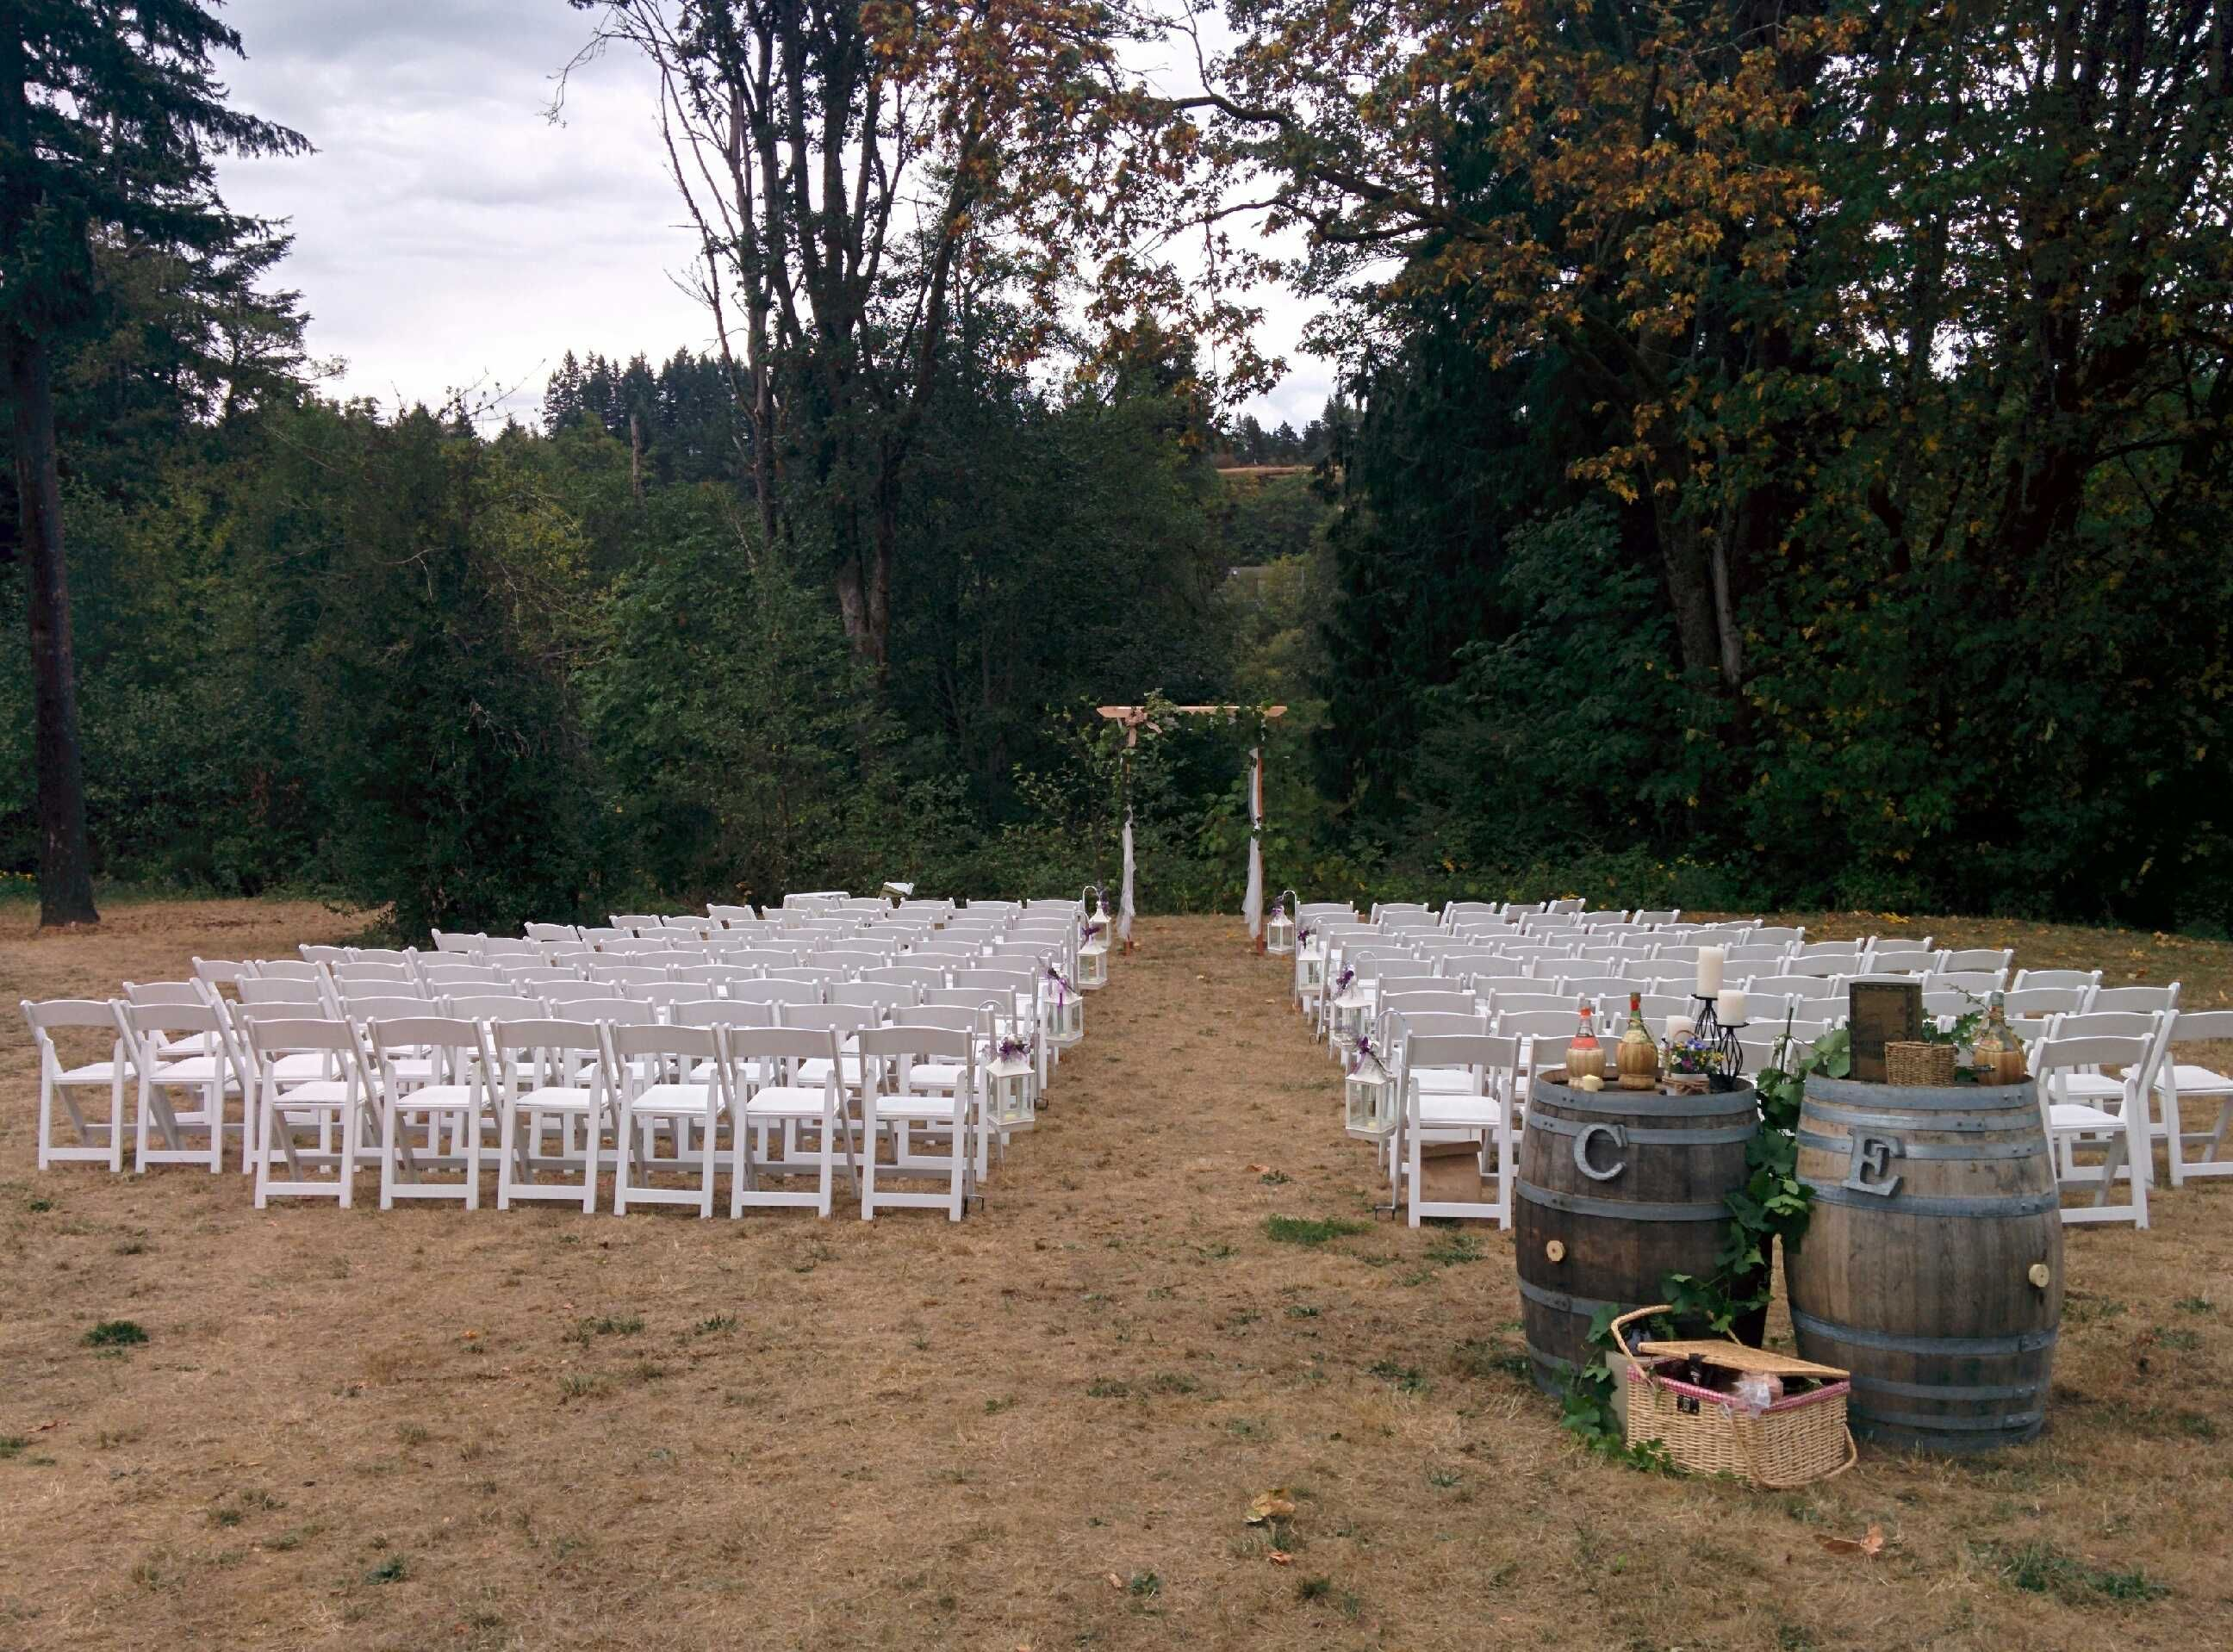 folding chair rental vancouver wicker lounge chairs pool italian theme wedding millstone winery nanaimo island bc aug 2015 decor rentals wood wine barrels ivy greenery